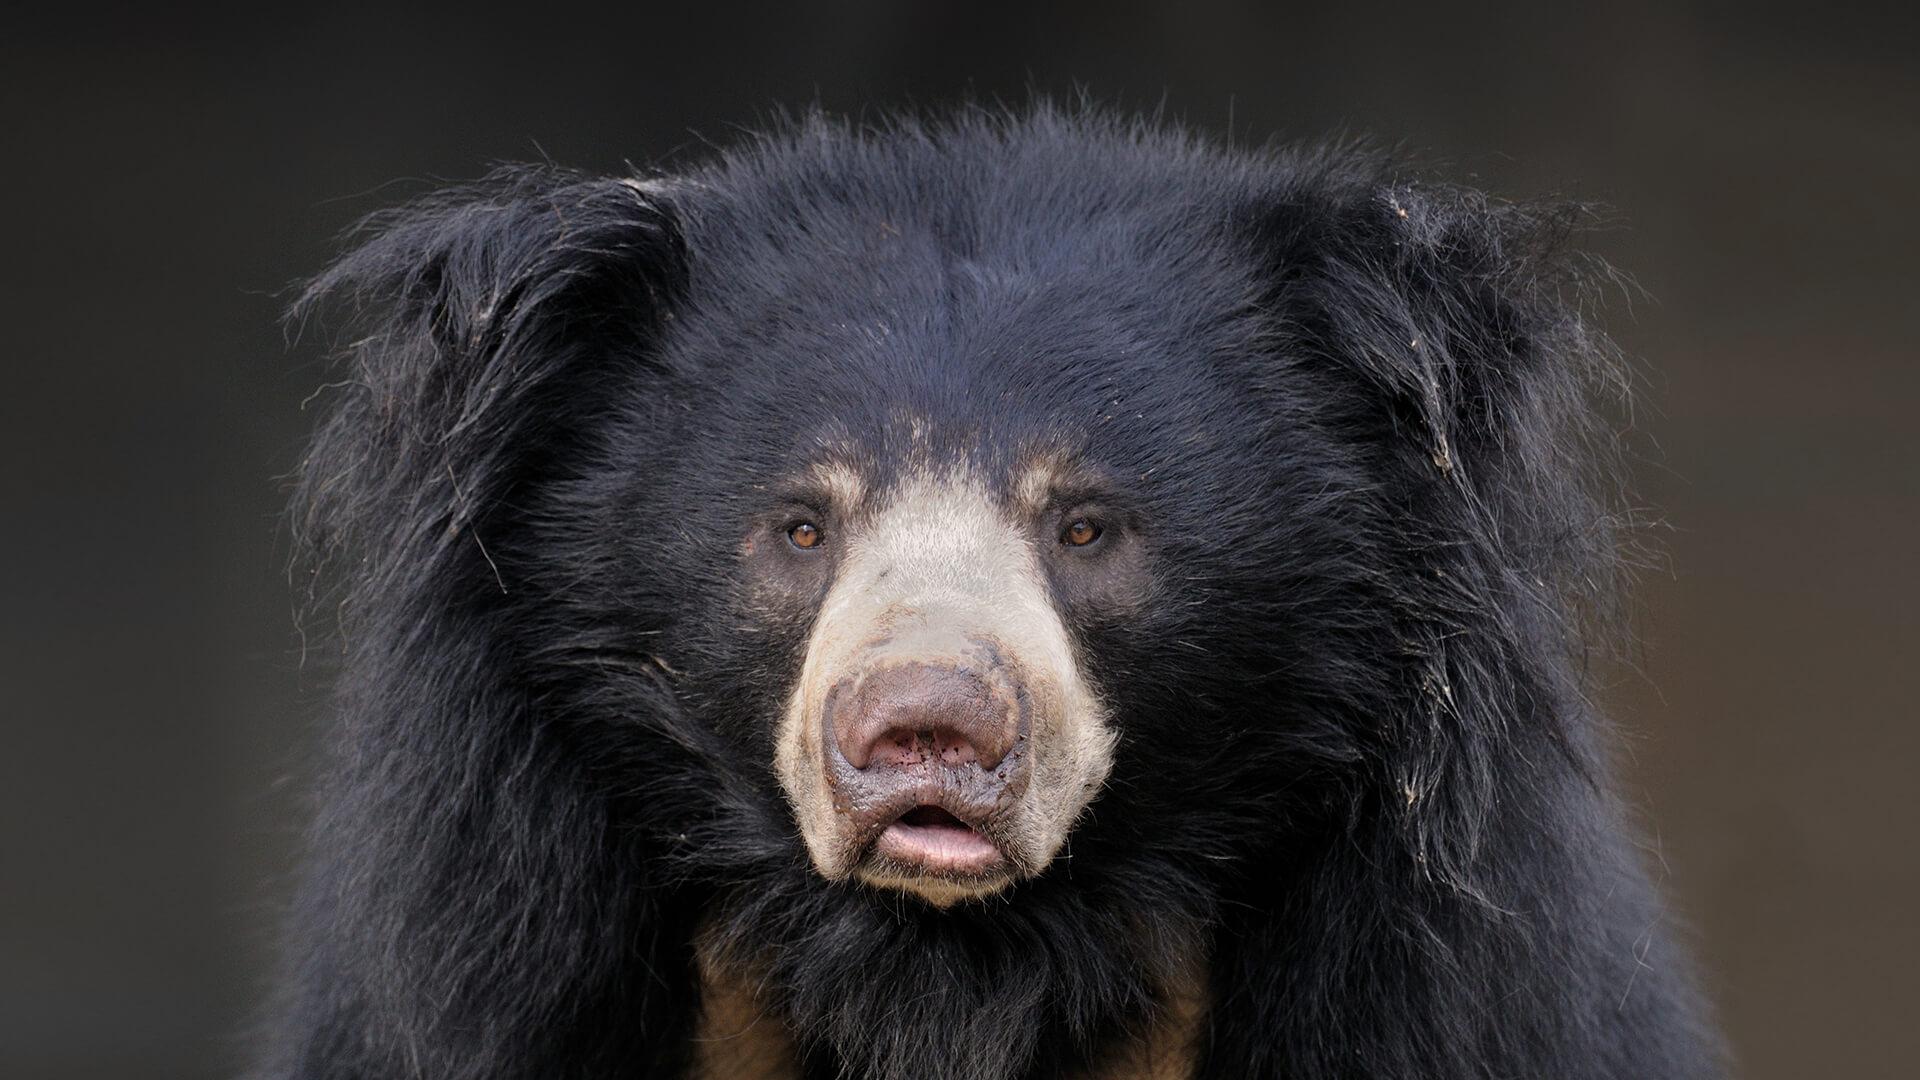 Forest Animal Wallpaper Sloth Bear San Diego Zoo Animals Amp Plants